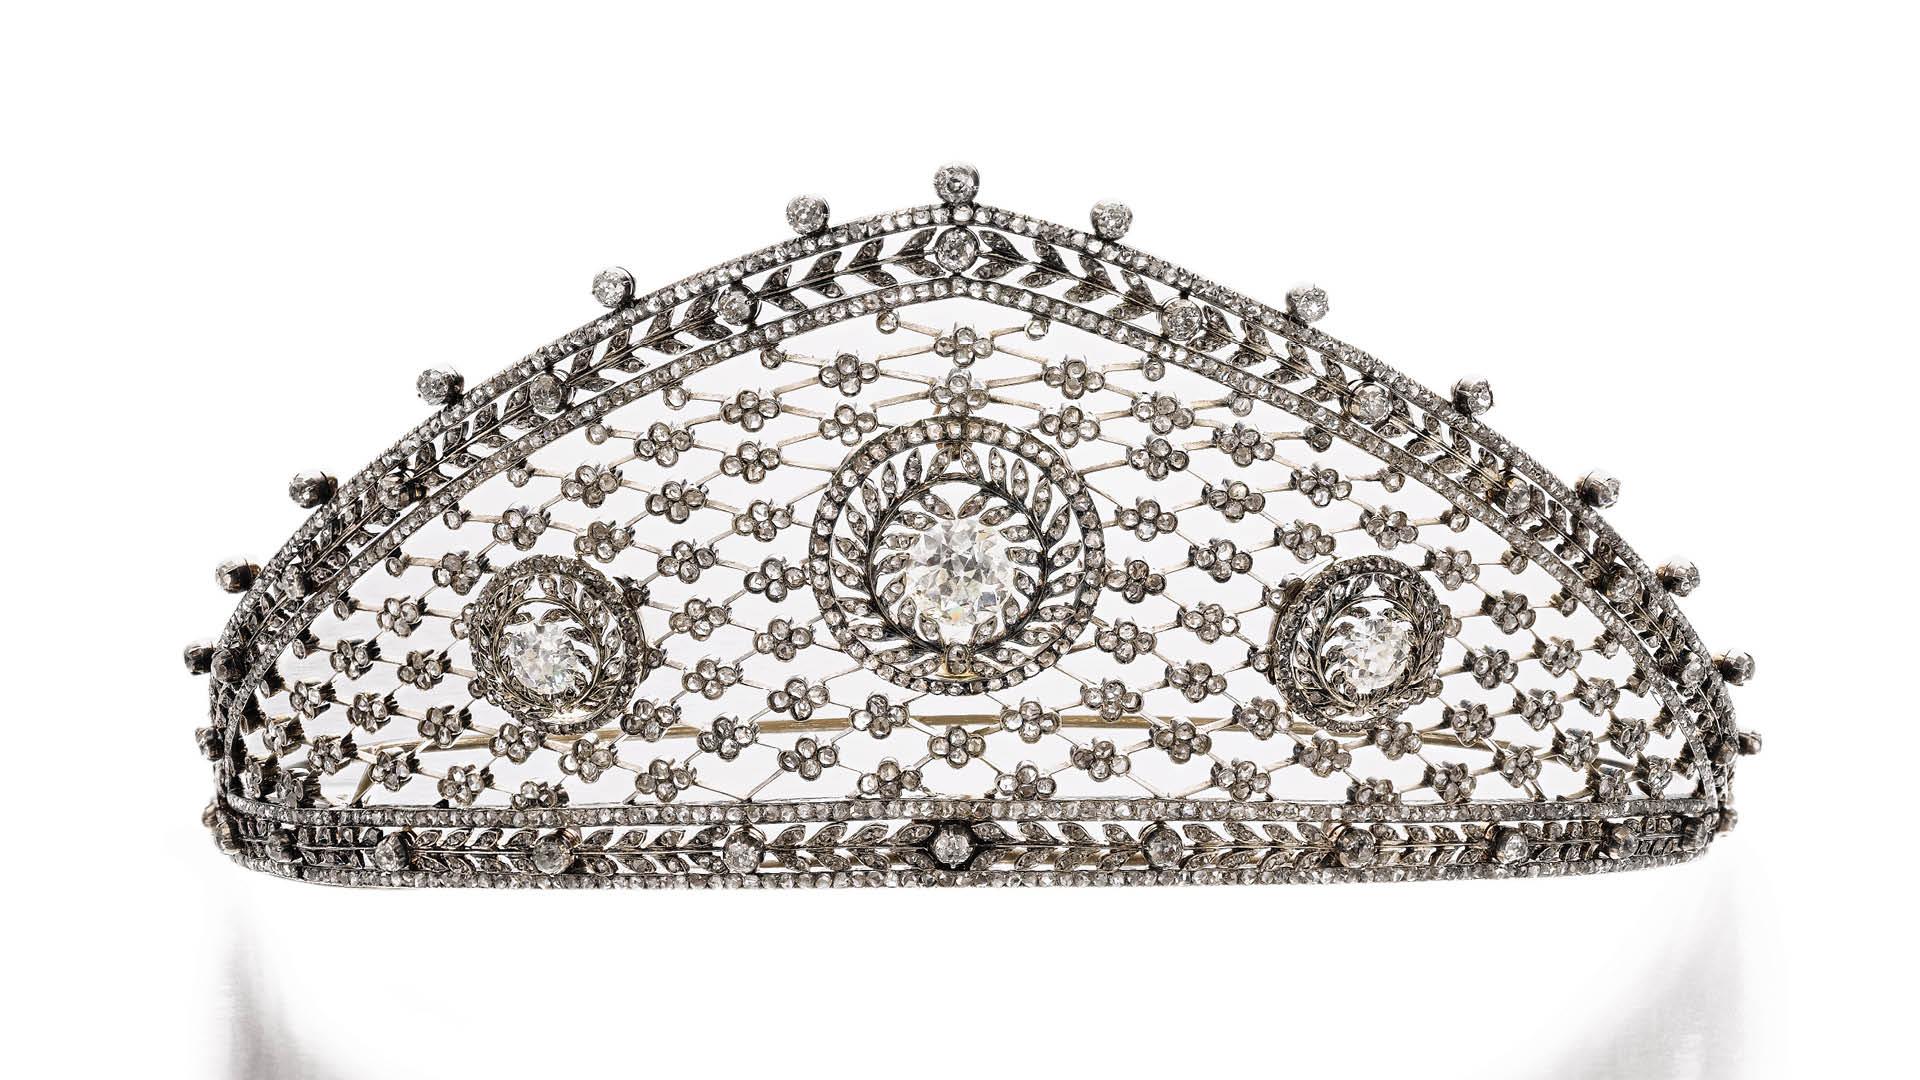 Sotheby's Faberge Tiara Geneva